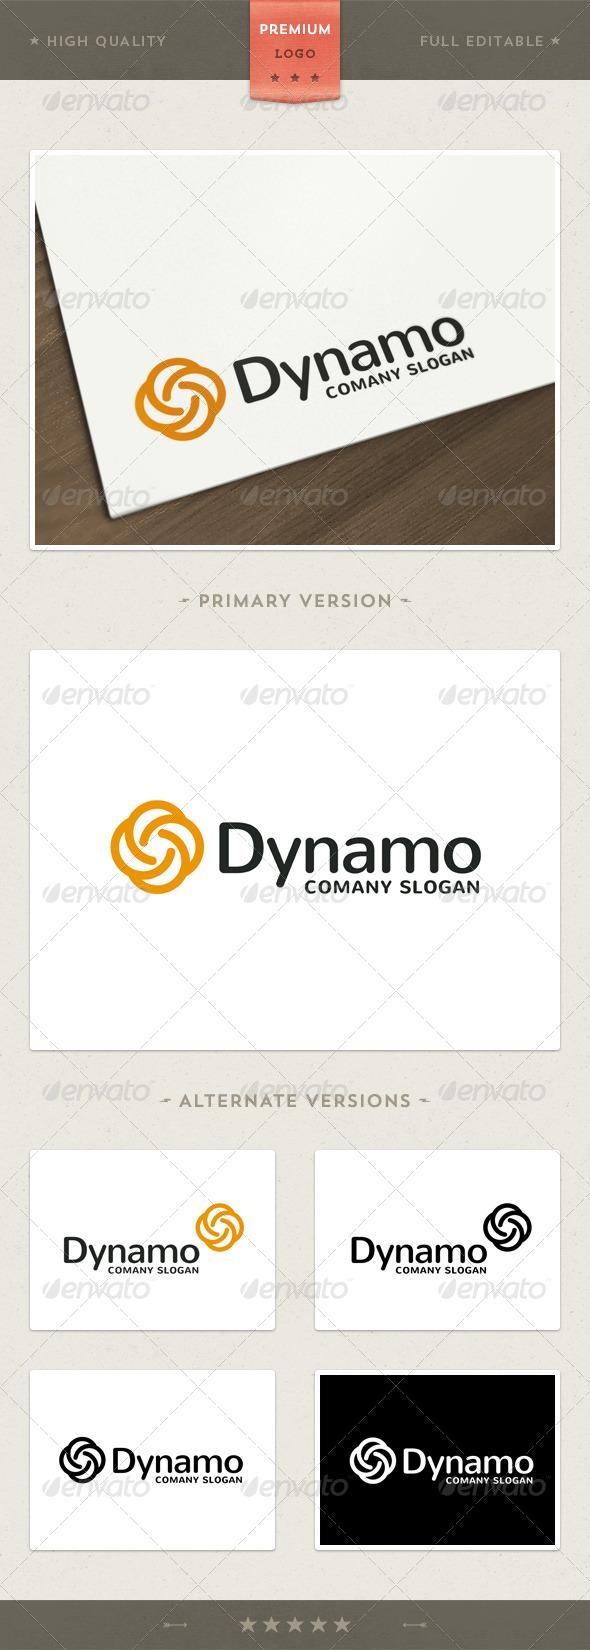 Dynamo - Symbols Logo Templates